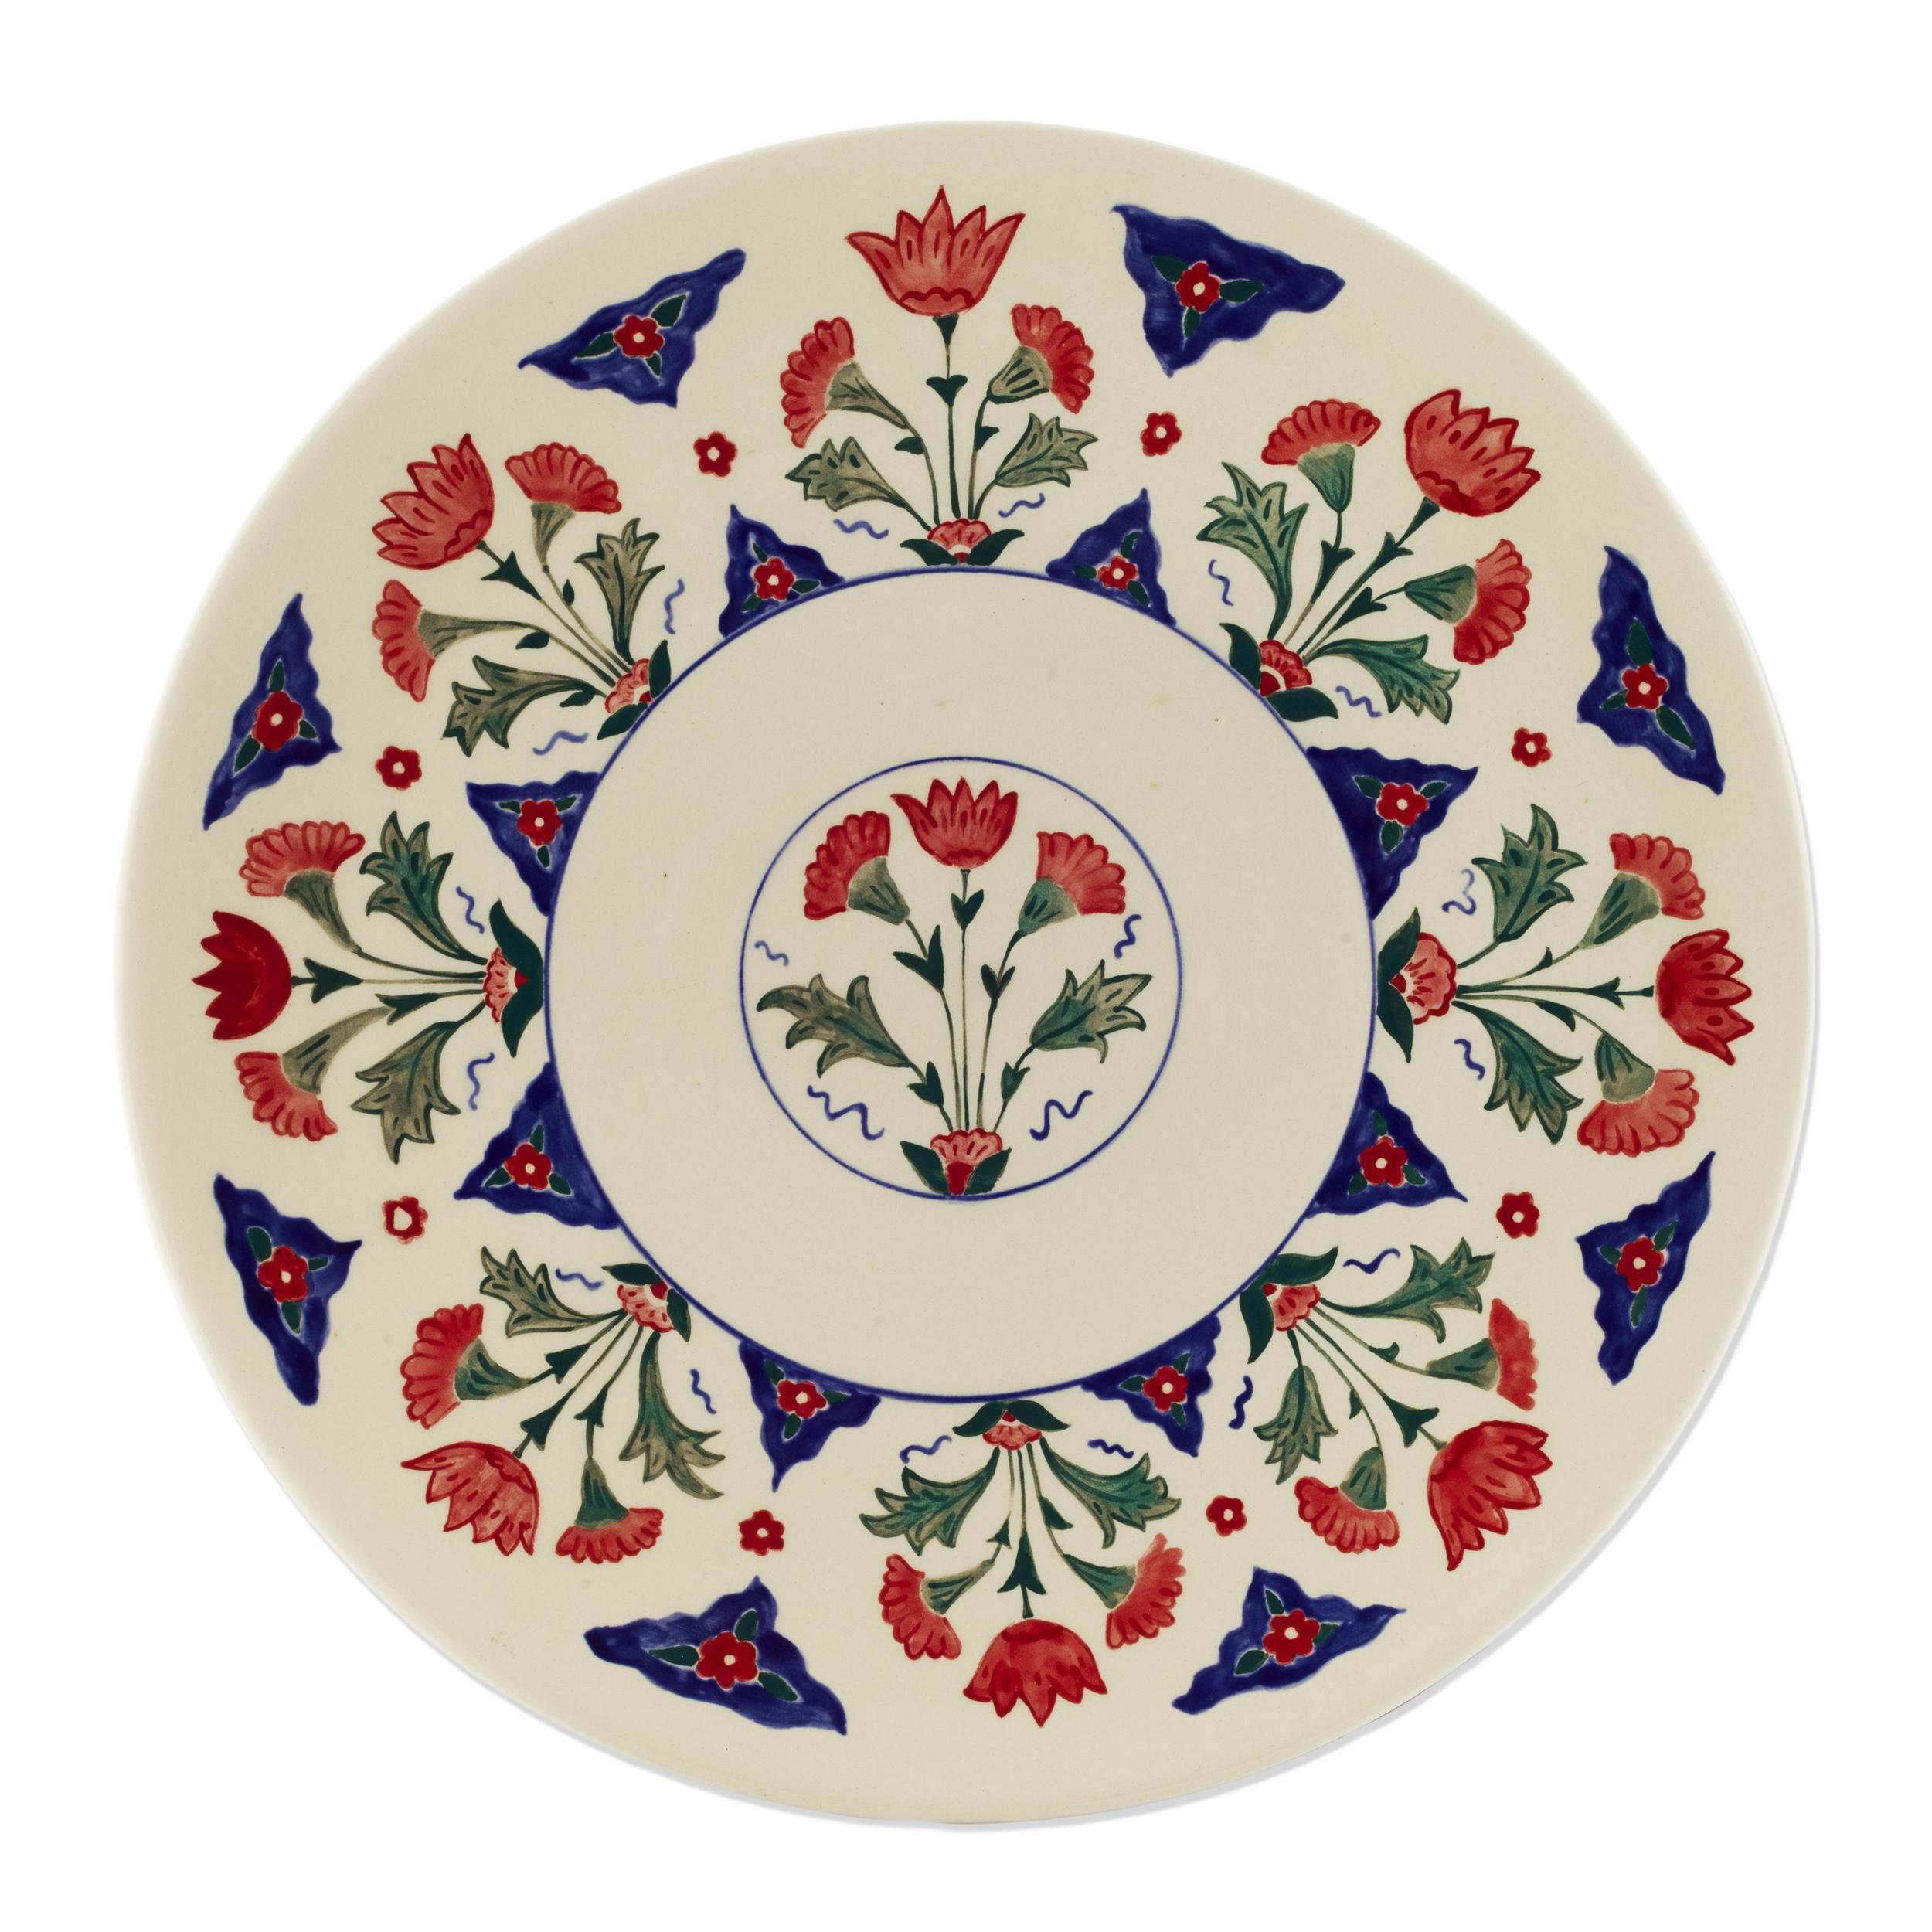 Iznik Plate 1 ~ Islimi, Ottoman Turkish Art, Islamic Art, Pattern Design, Shaheen Kasmani.